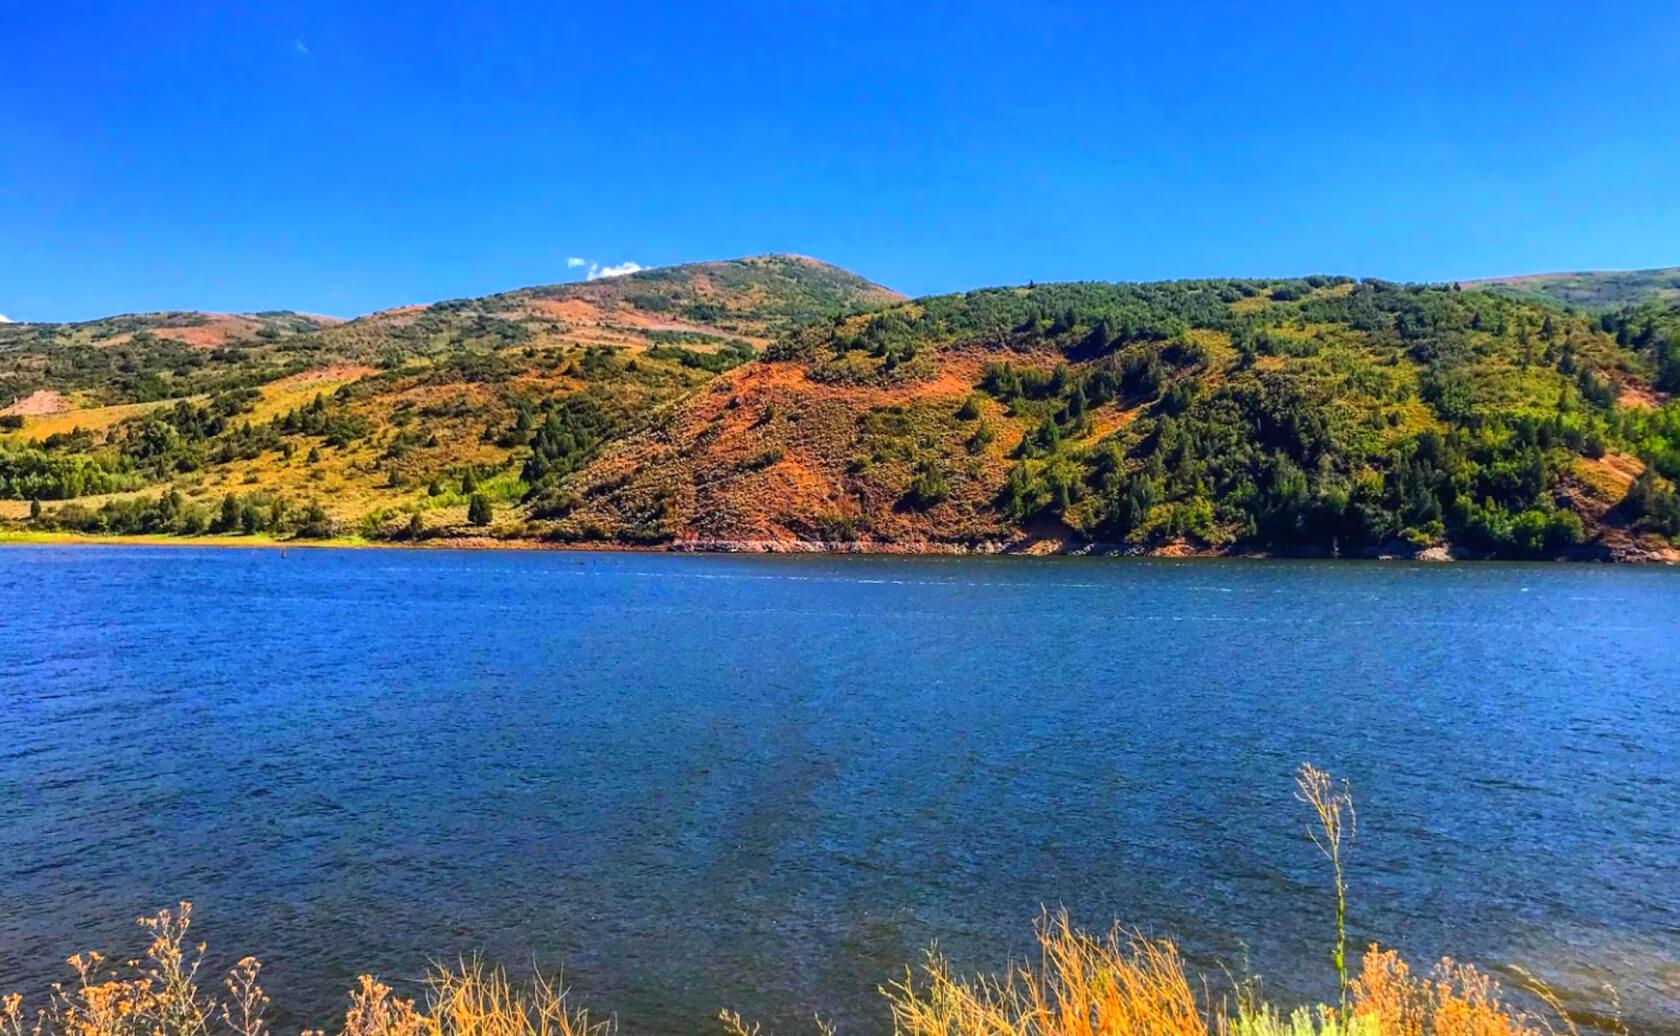 Jordanelle-Lake-Fishing-Guide-Report-Idaho-03